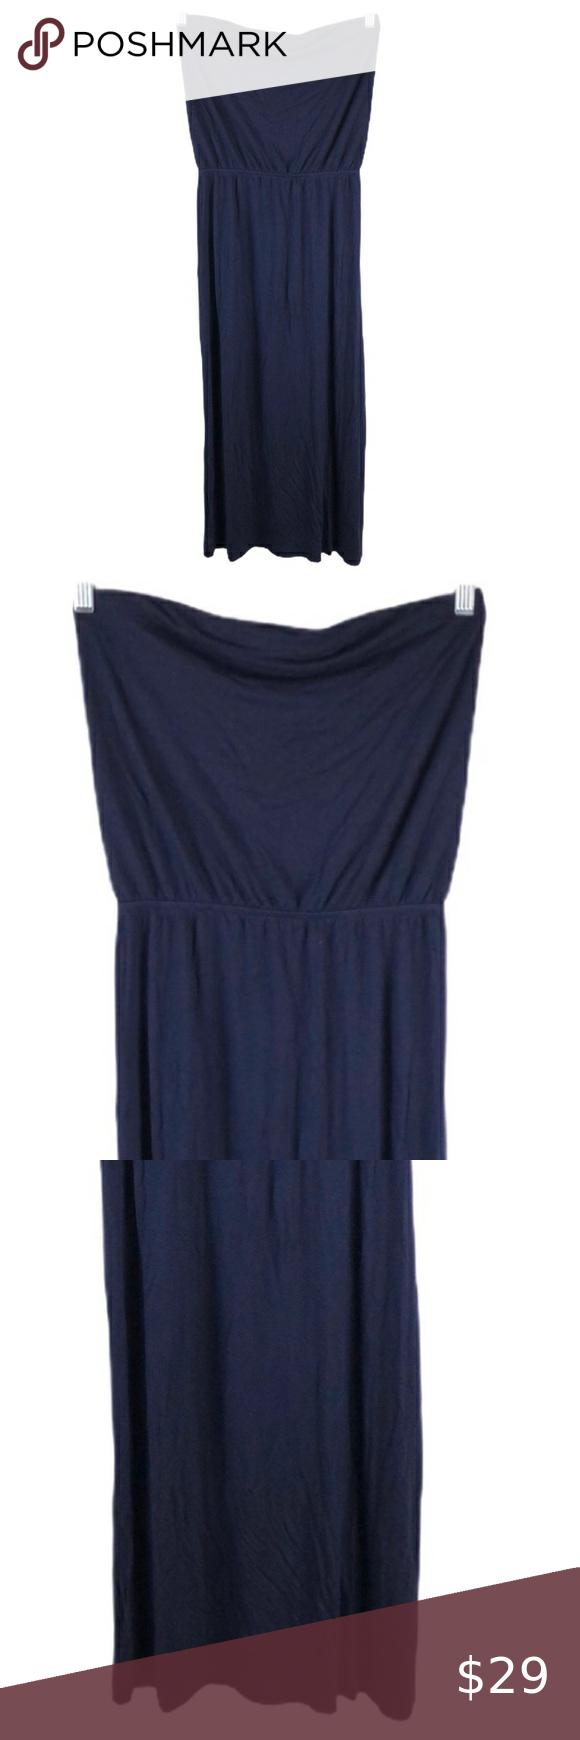 Gap Navy Strapless Maxi Dress Strapless Maxi Dress Maxi Dress Strapless Maxi [ 1740 x 580 Pixel ]